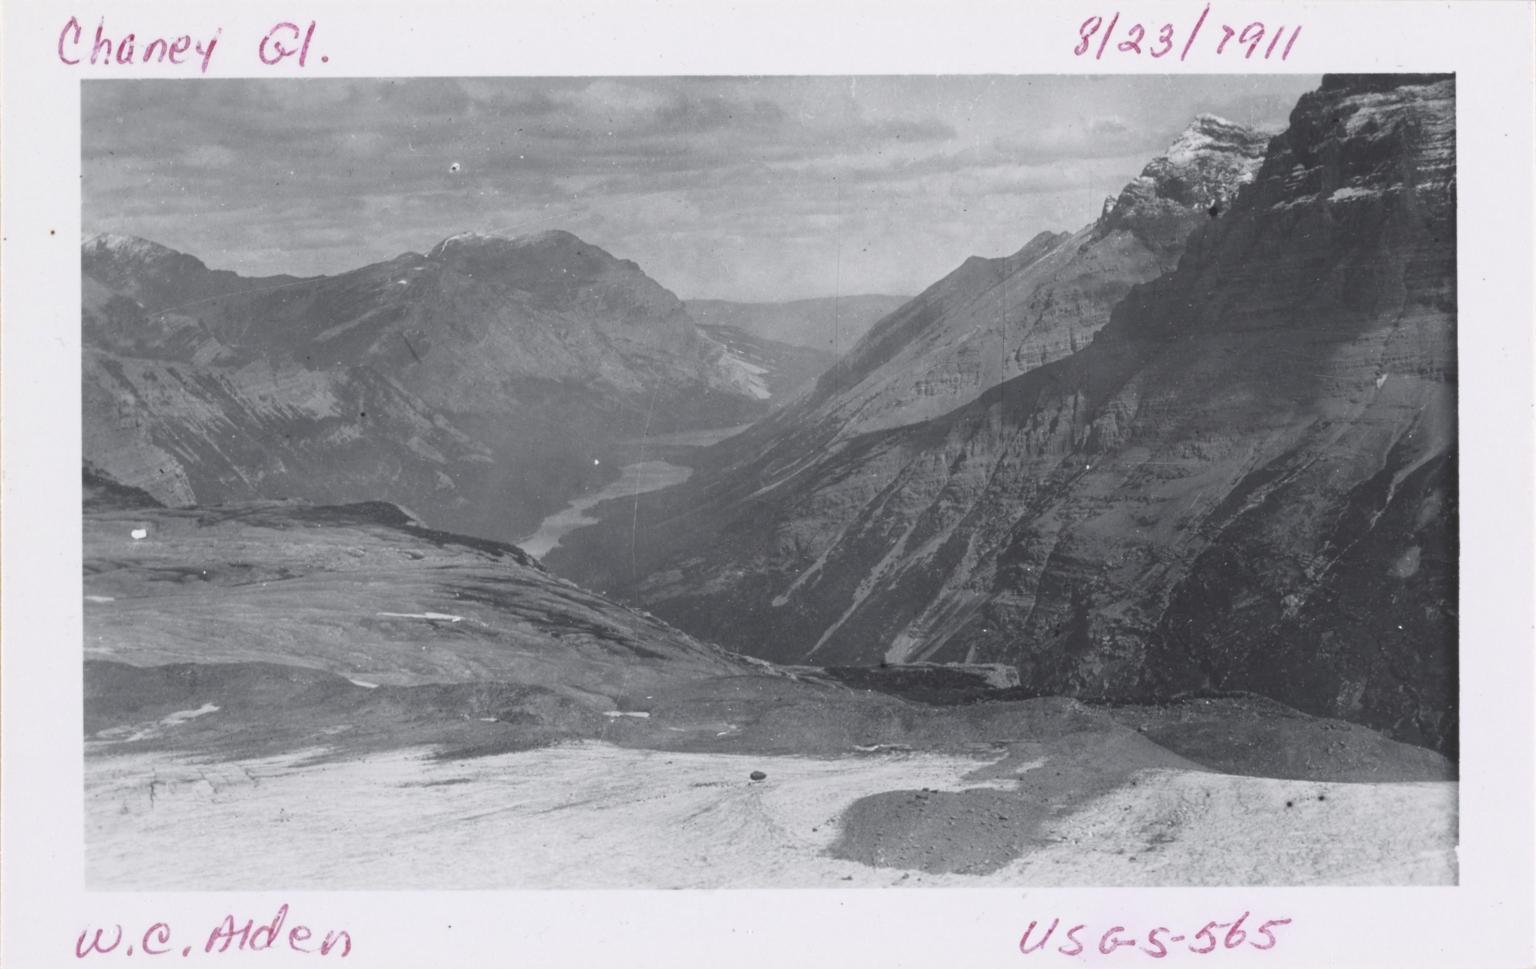 Chaney Glacier, Montana